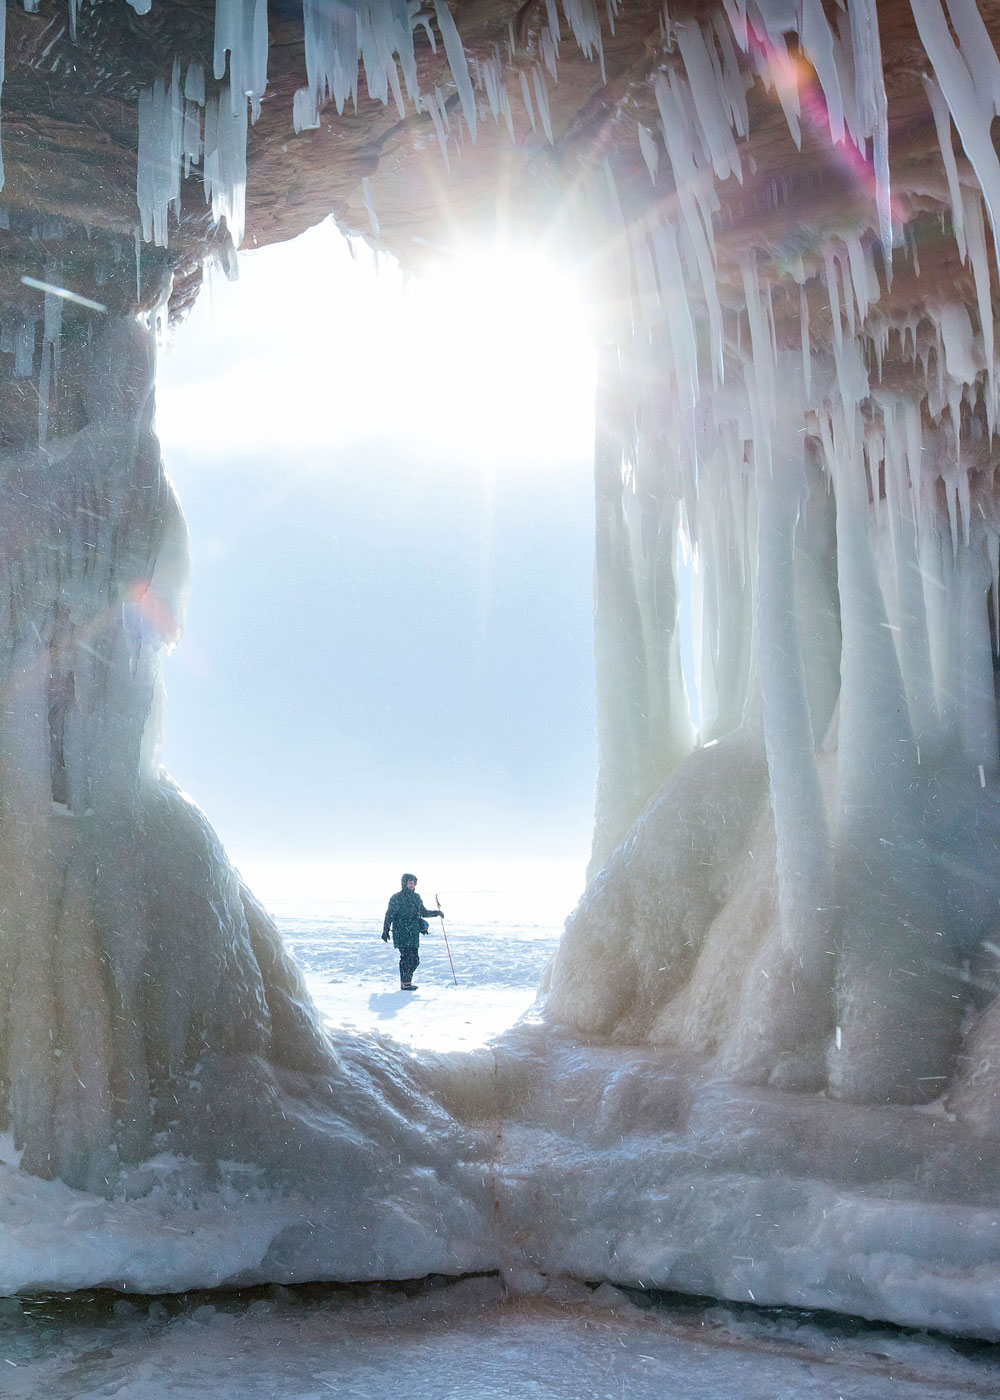 Ice caving